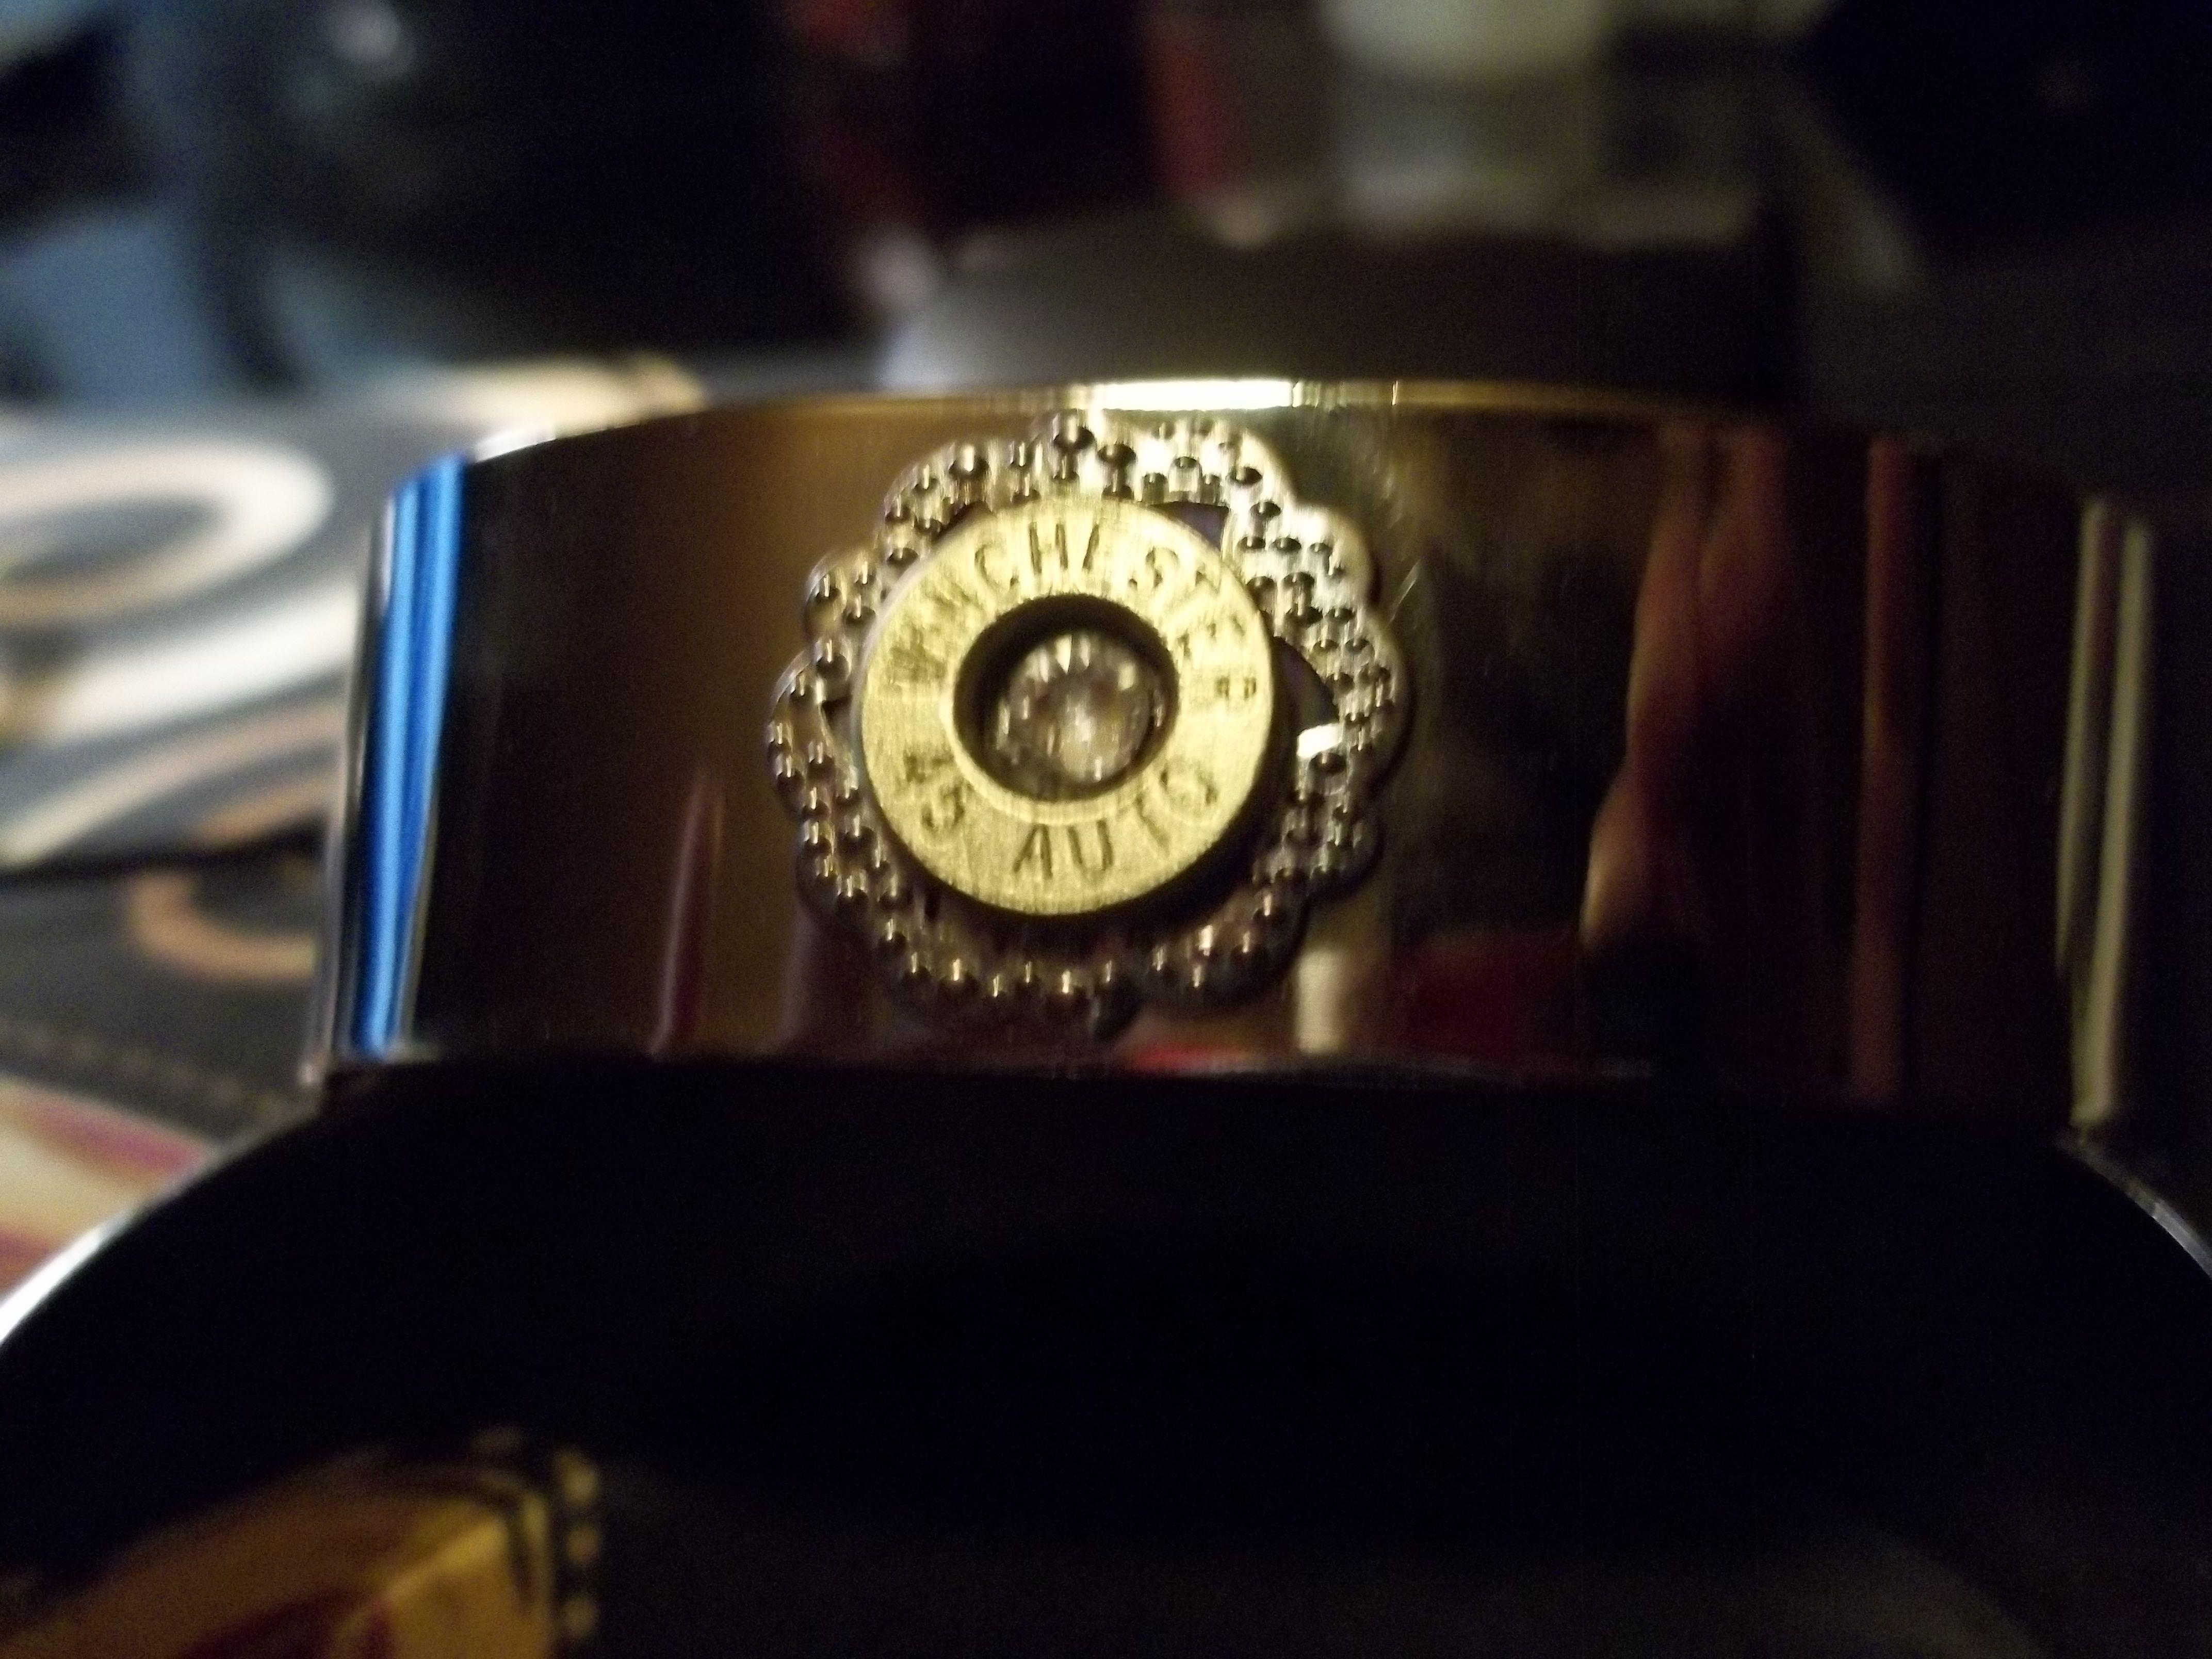 Silvertone cuff bracelet with Clear Swarovski crystal. $35.00.